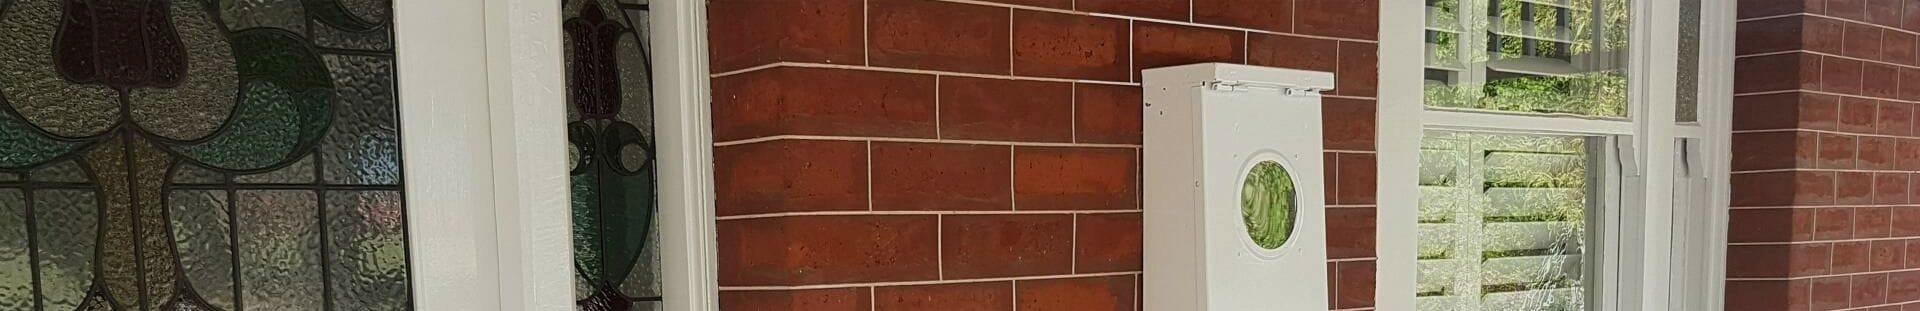 Brick & Mortar Western Australia | Thor Helical Remedial Solutions